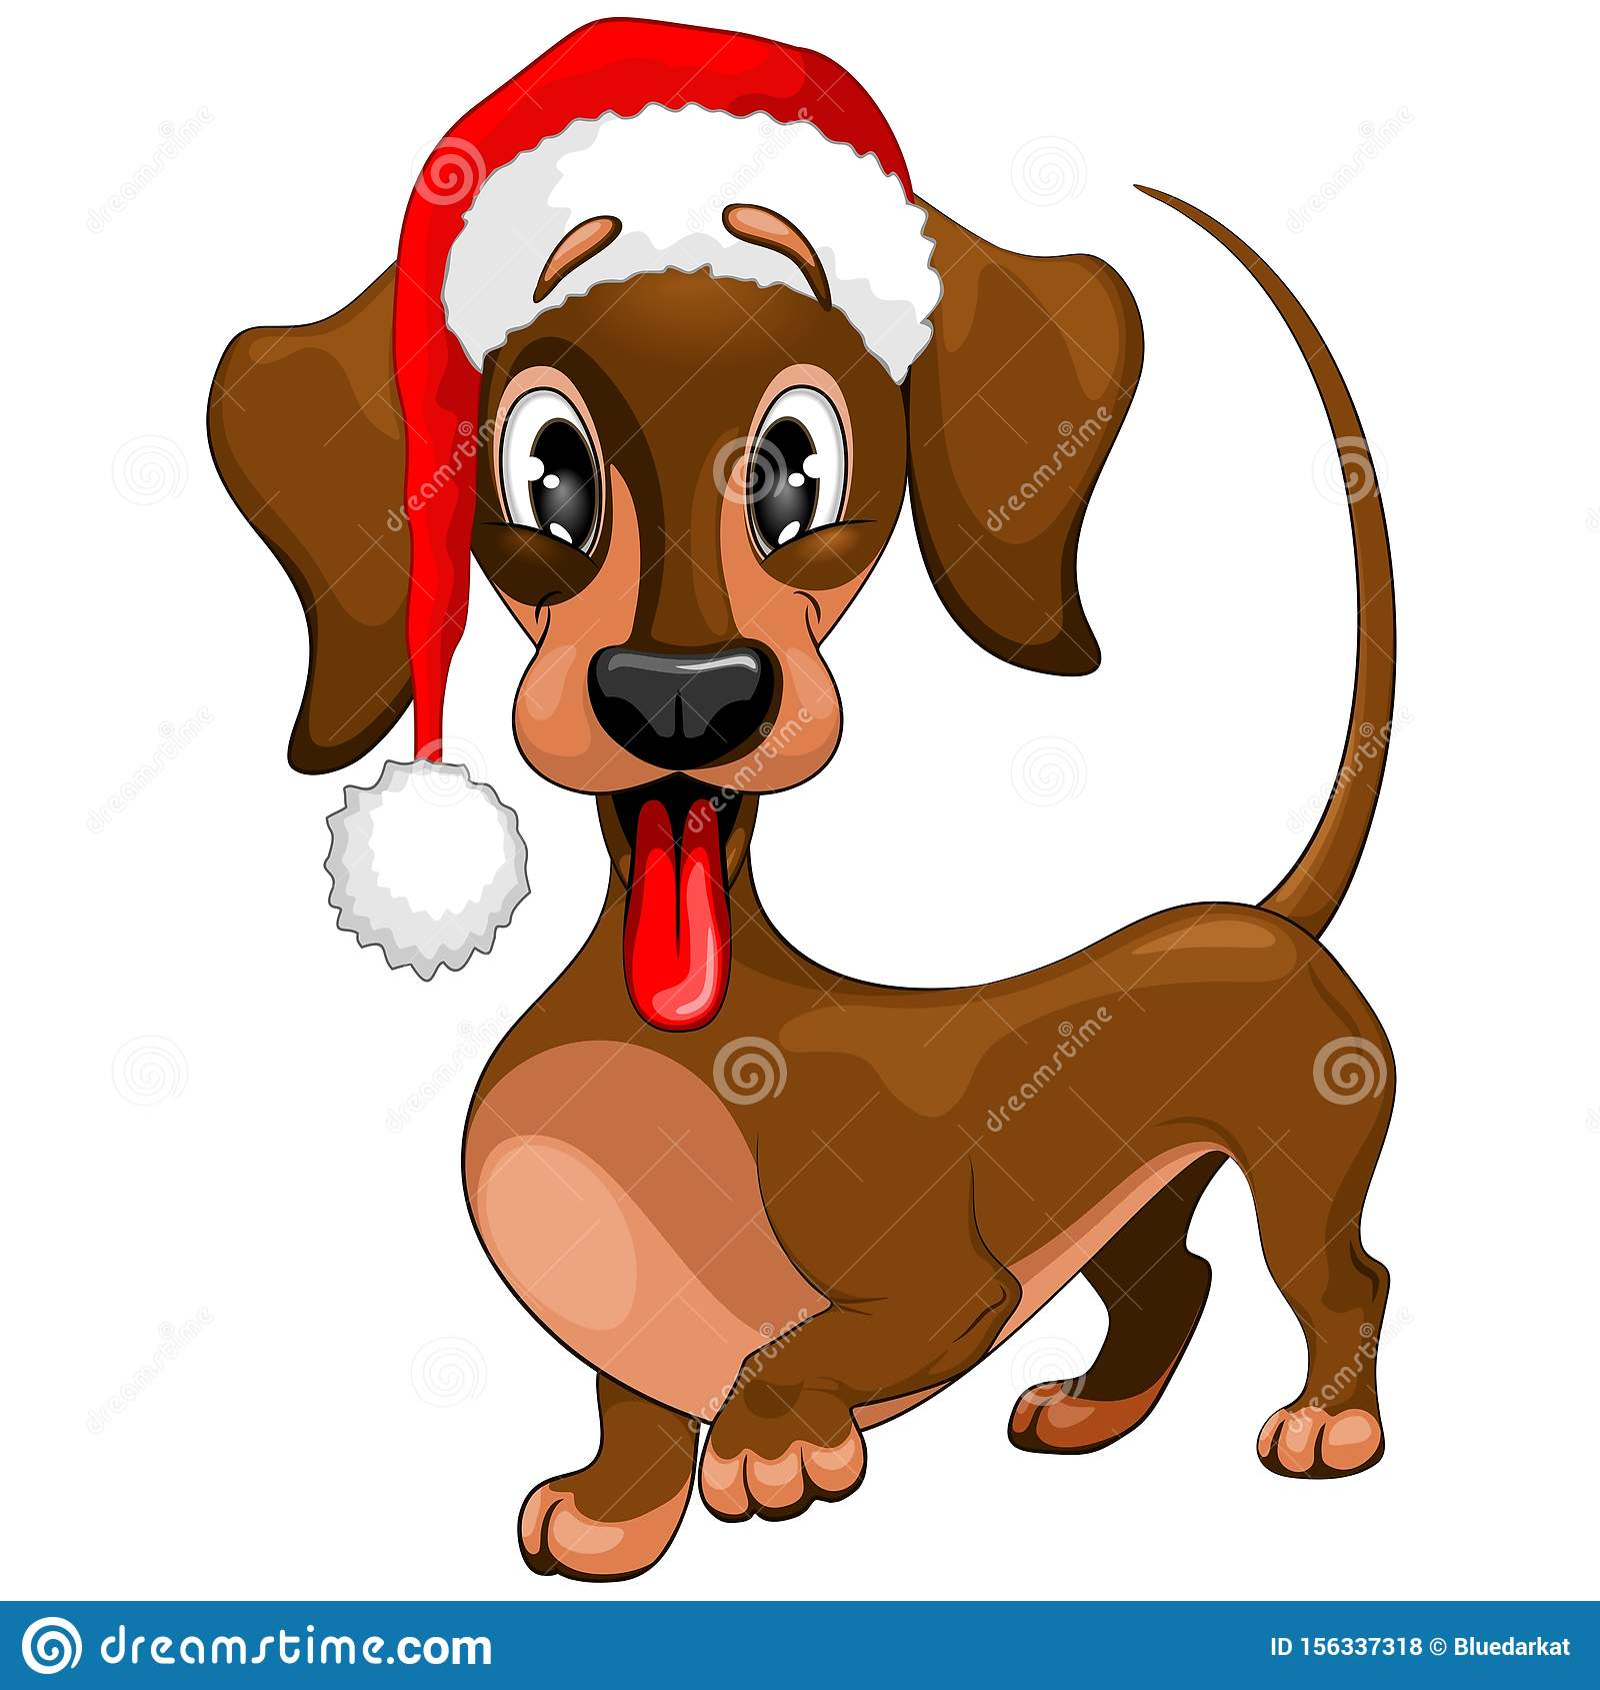 Dachshund Christmas Santa Cute Cartoon Character Vector Illustration Stock Vector Illustration Of Friend Christmasholidays 156337318